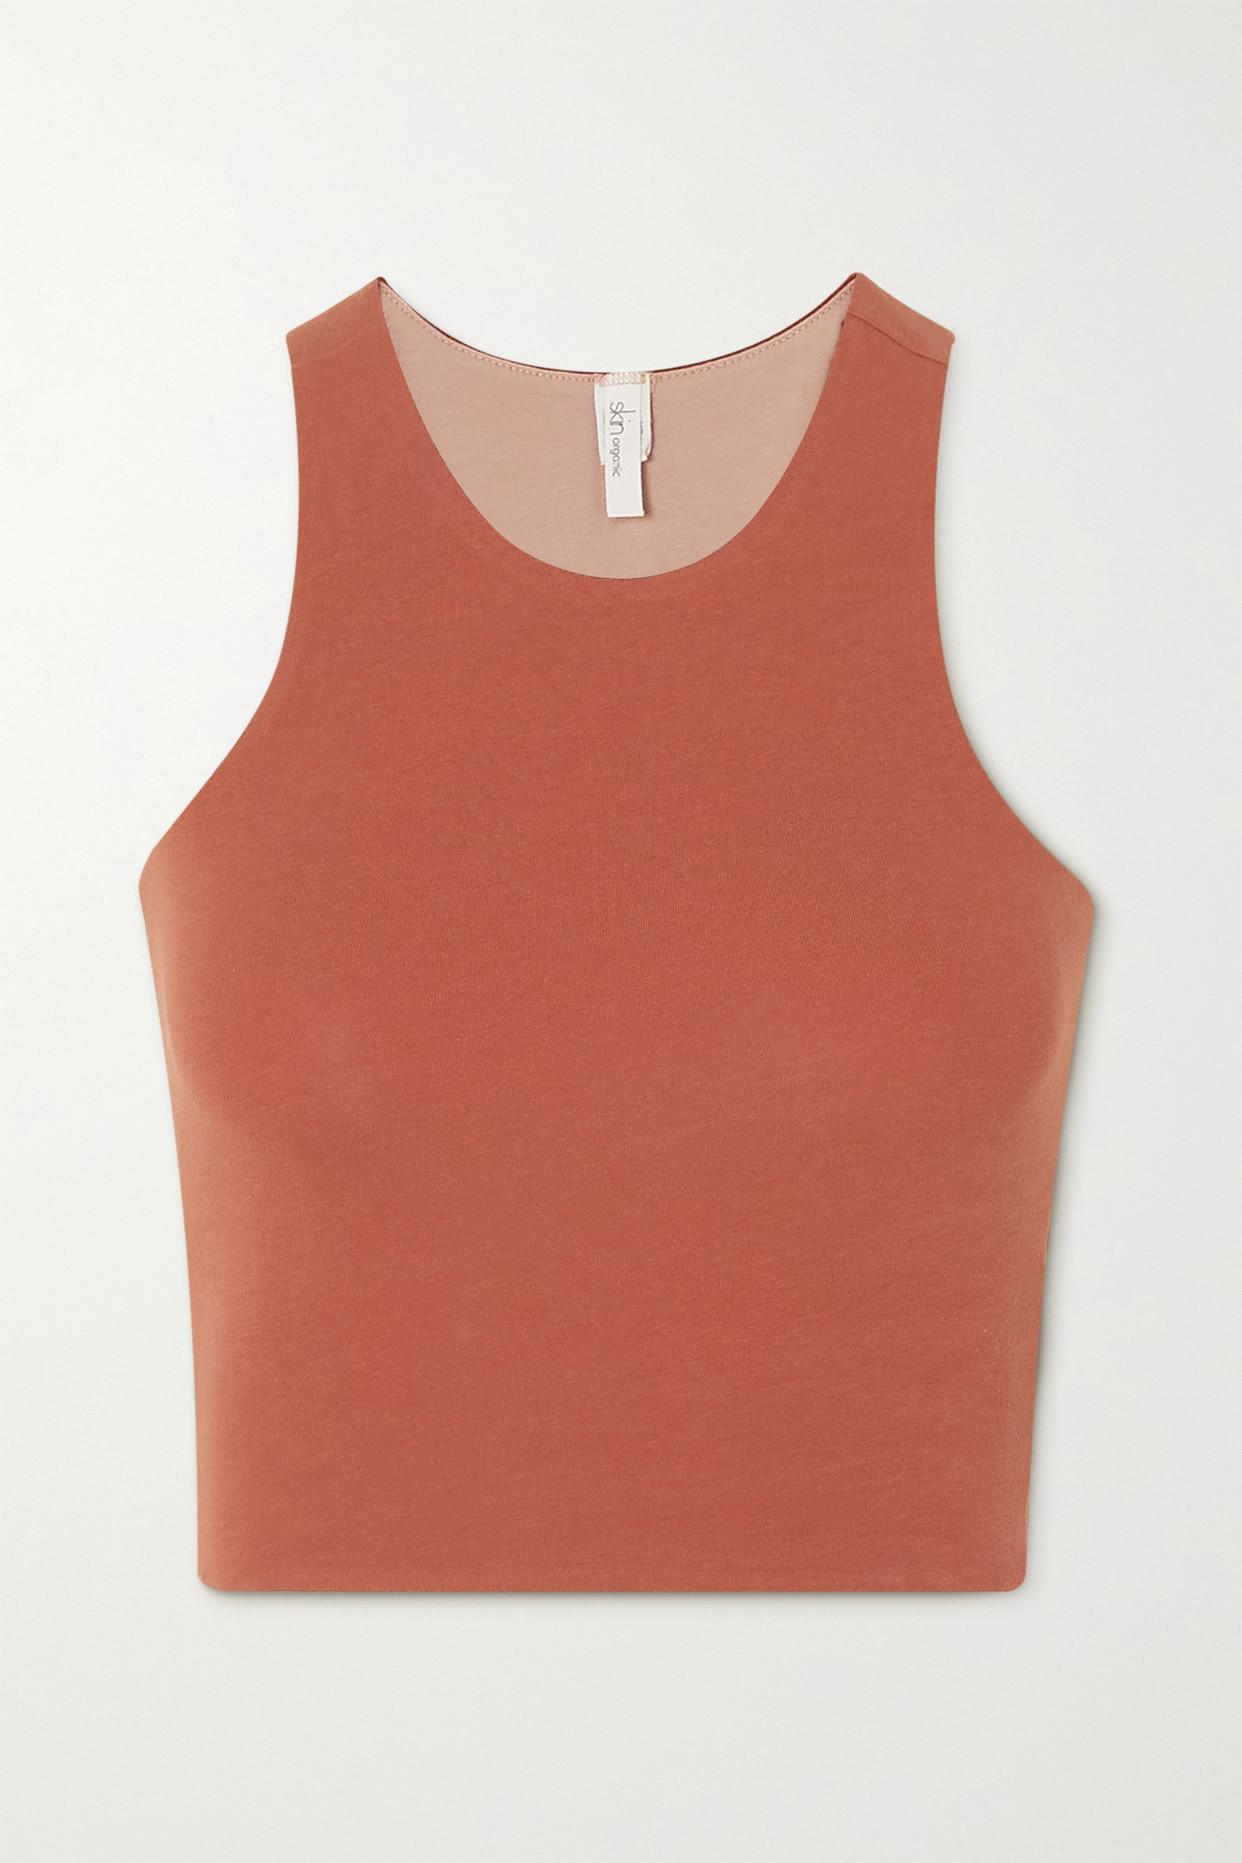 SKIN - + Net Sustain Calliope Reversible Cropped Stretch Organic Pima Cotton-jersey Tank - Brown - x